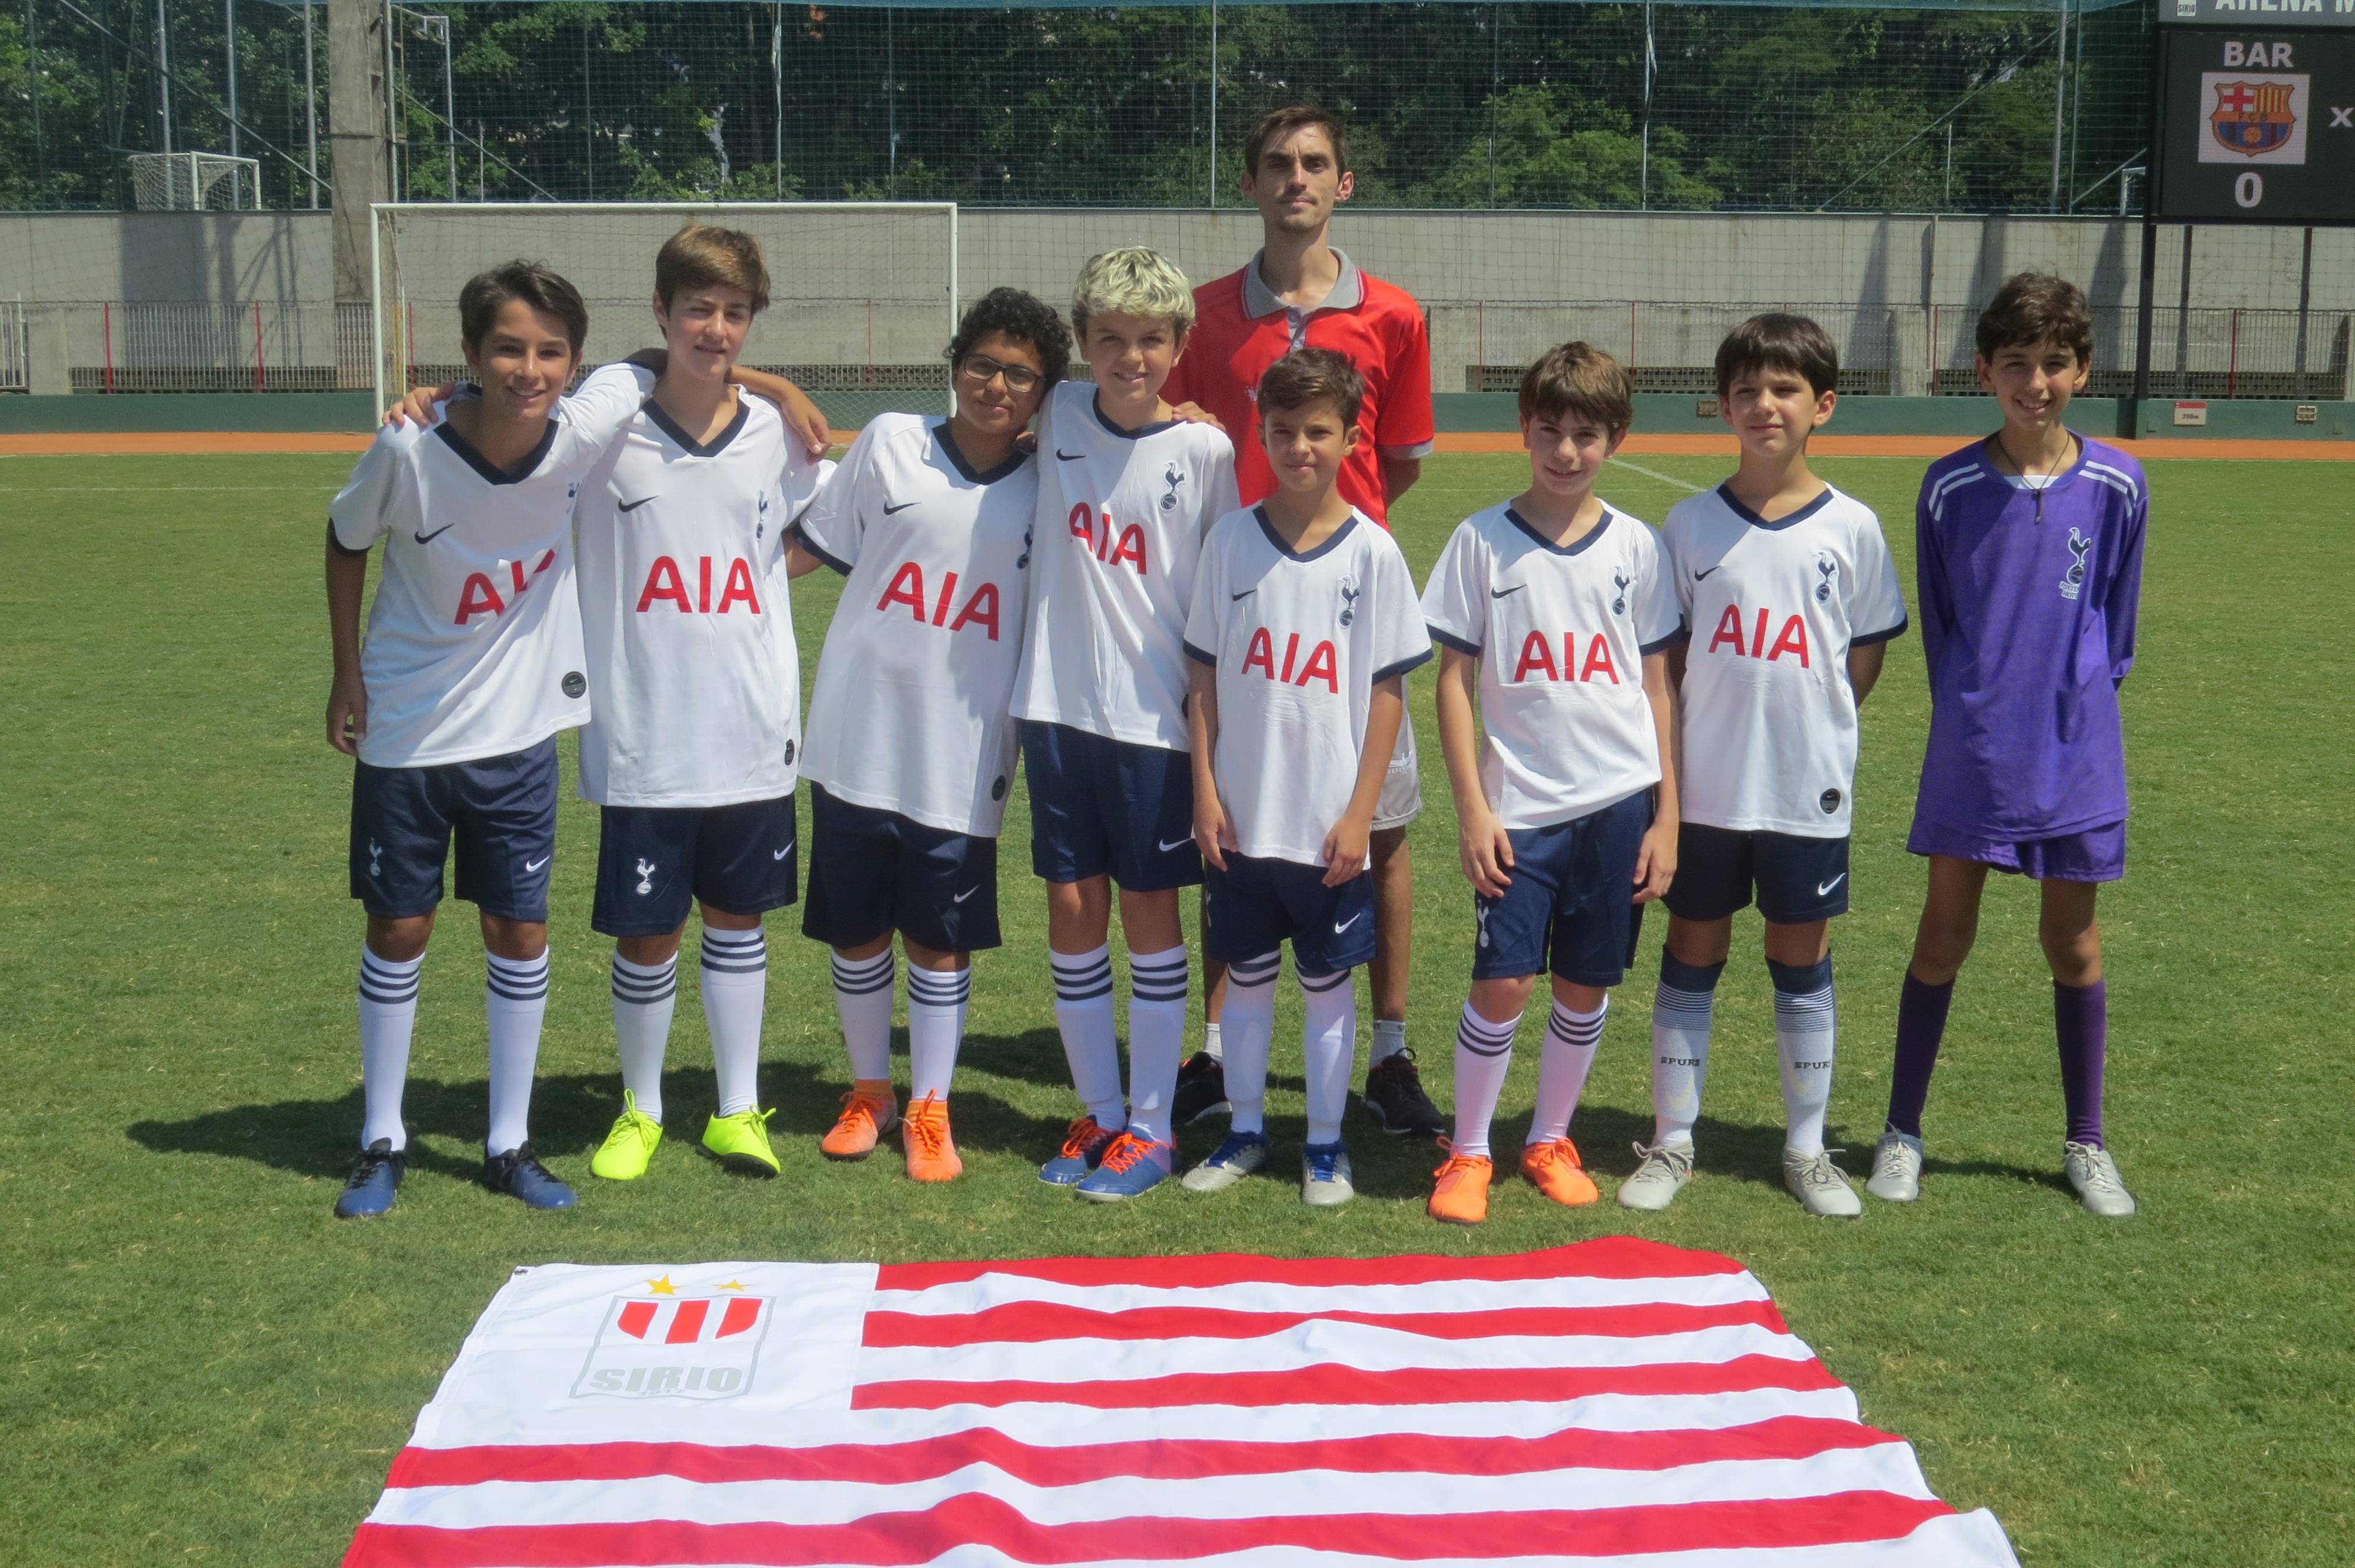 Infantil: Tottenham 9x2 Liverpool